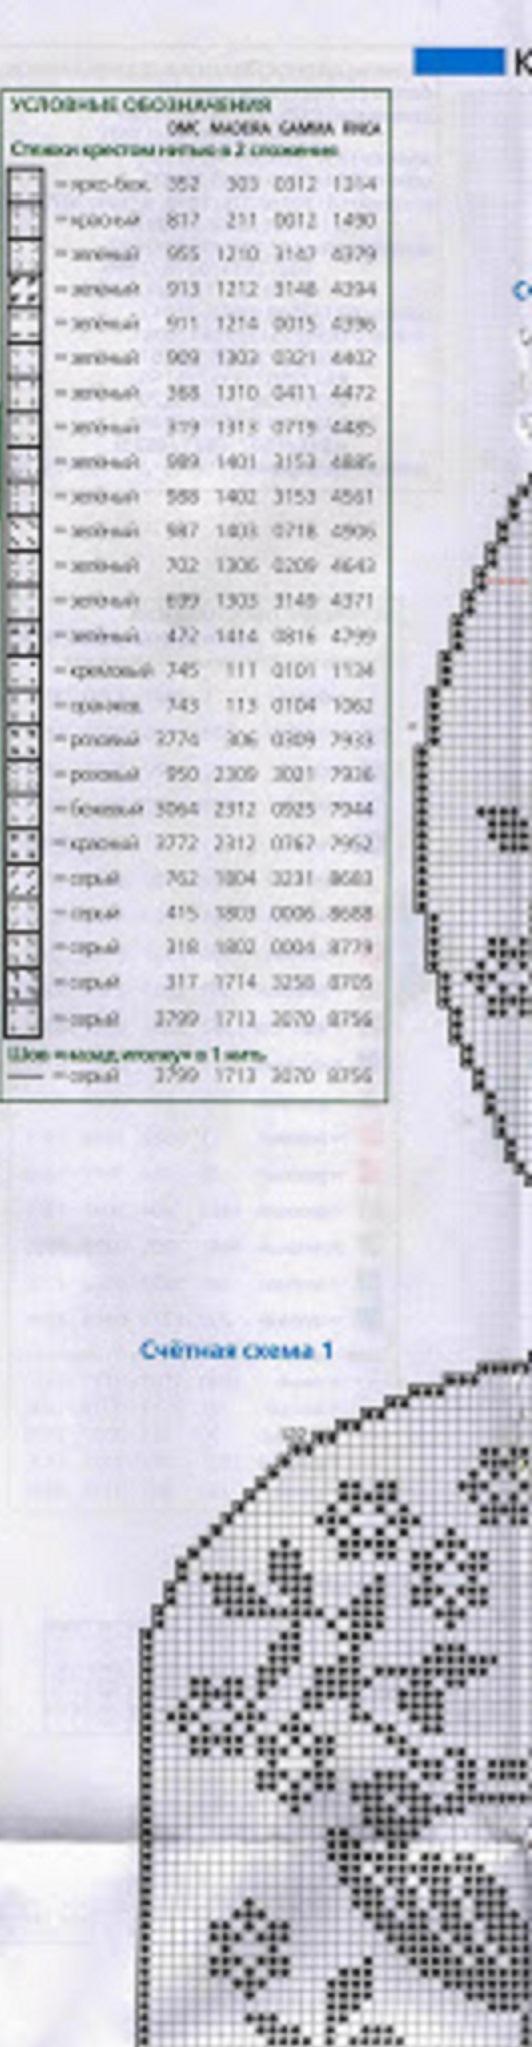 88239470234902 (3)